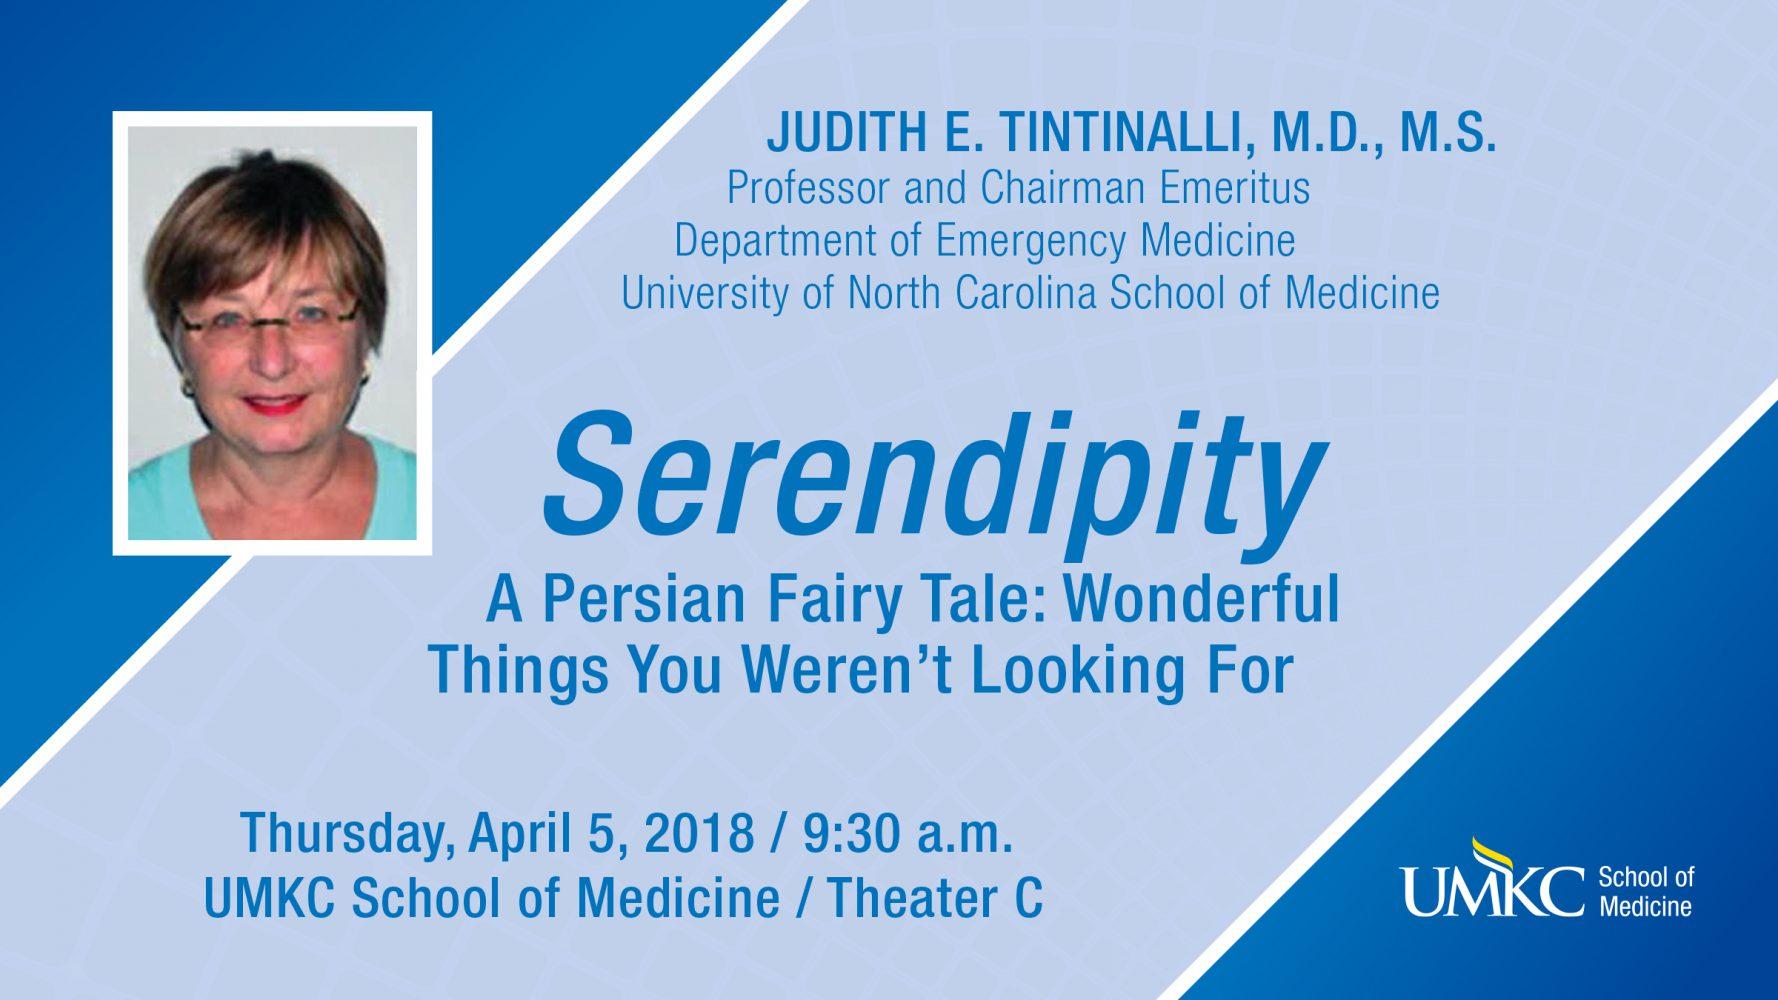 Serendipity - Judith E. Tintinalli, M.D., M.S. @ UMKC School of Medicine, Theater C